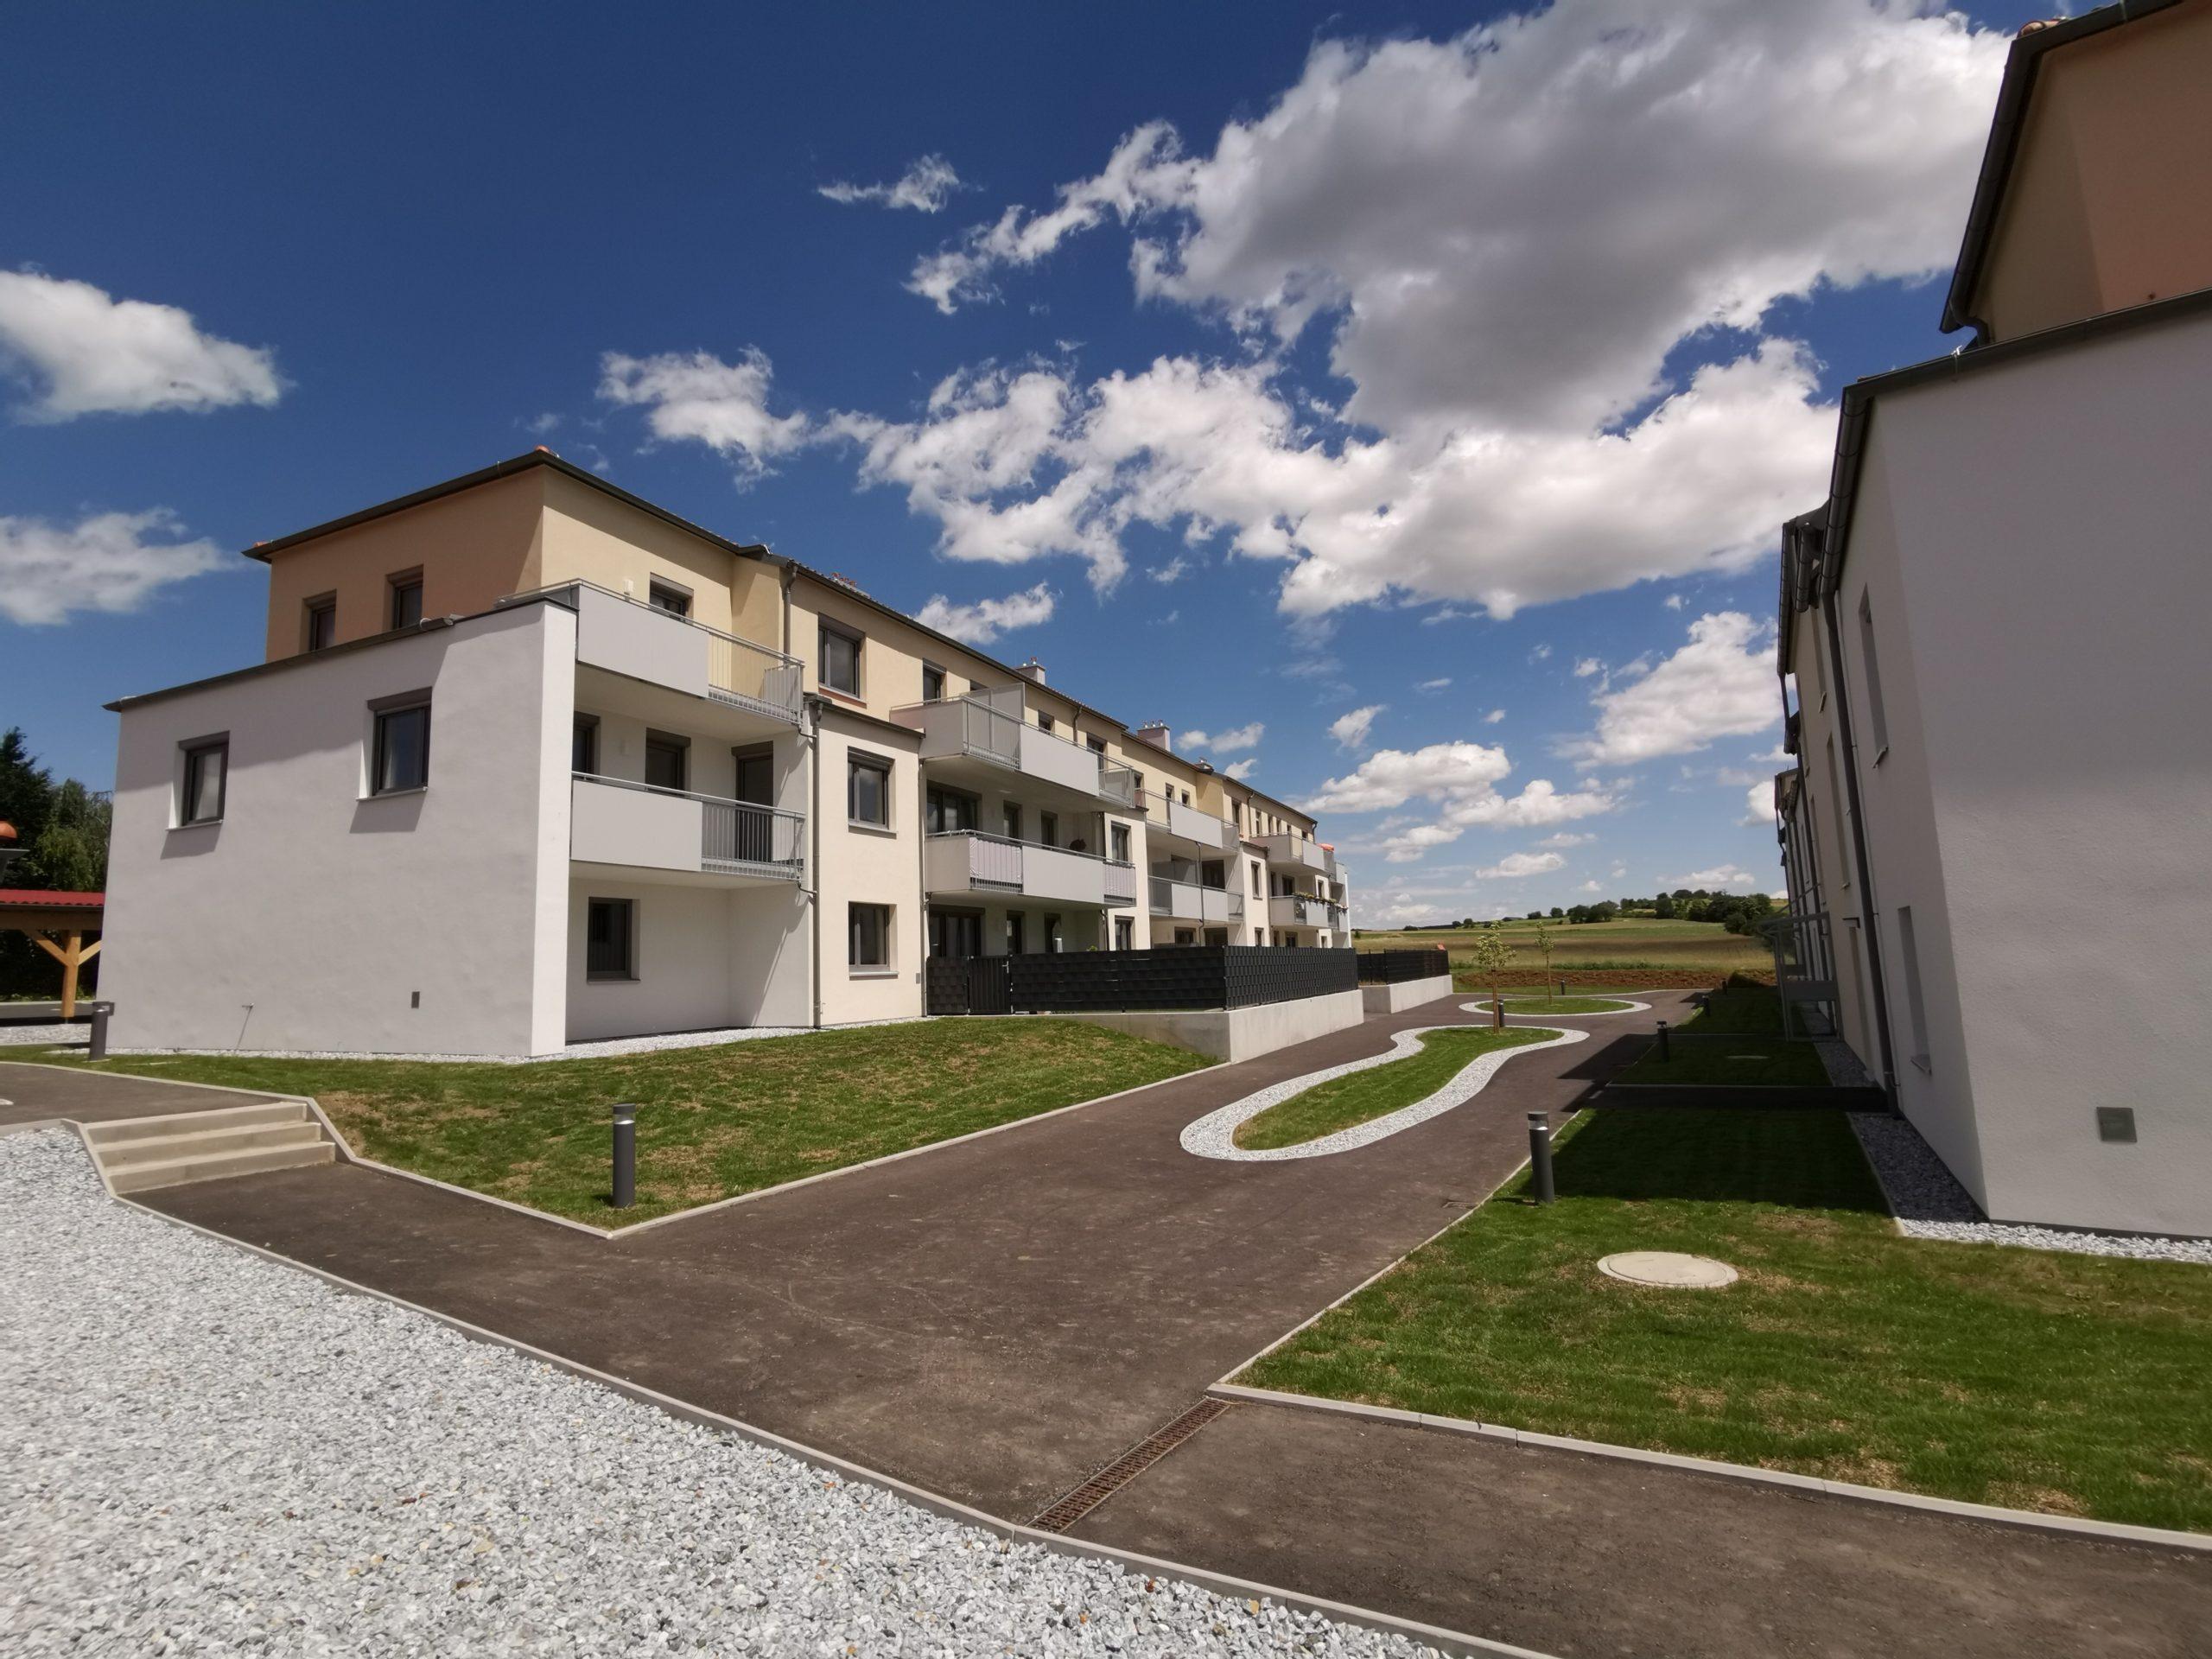 Immobilie von Kamptal in 3571 Gars am Kamp, Horn - Top: 408 #0